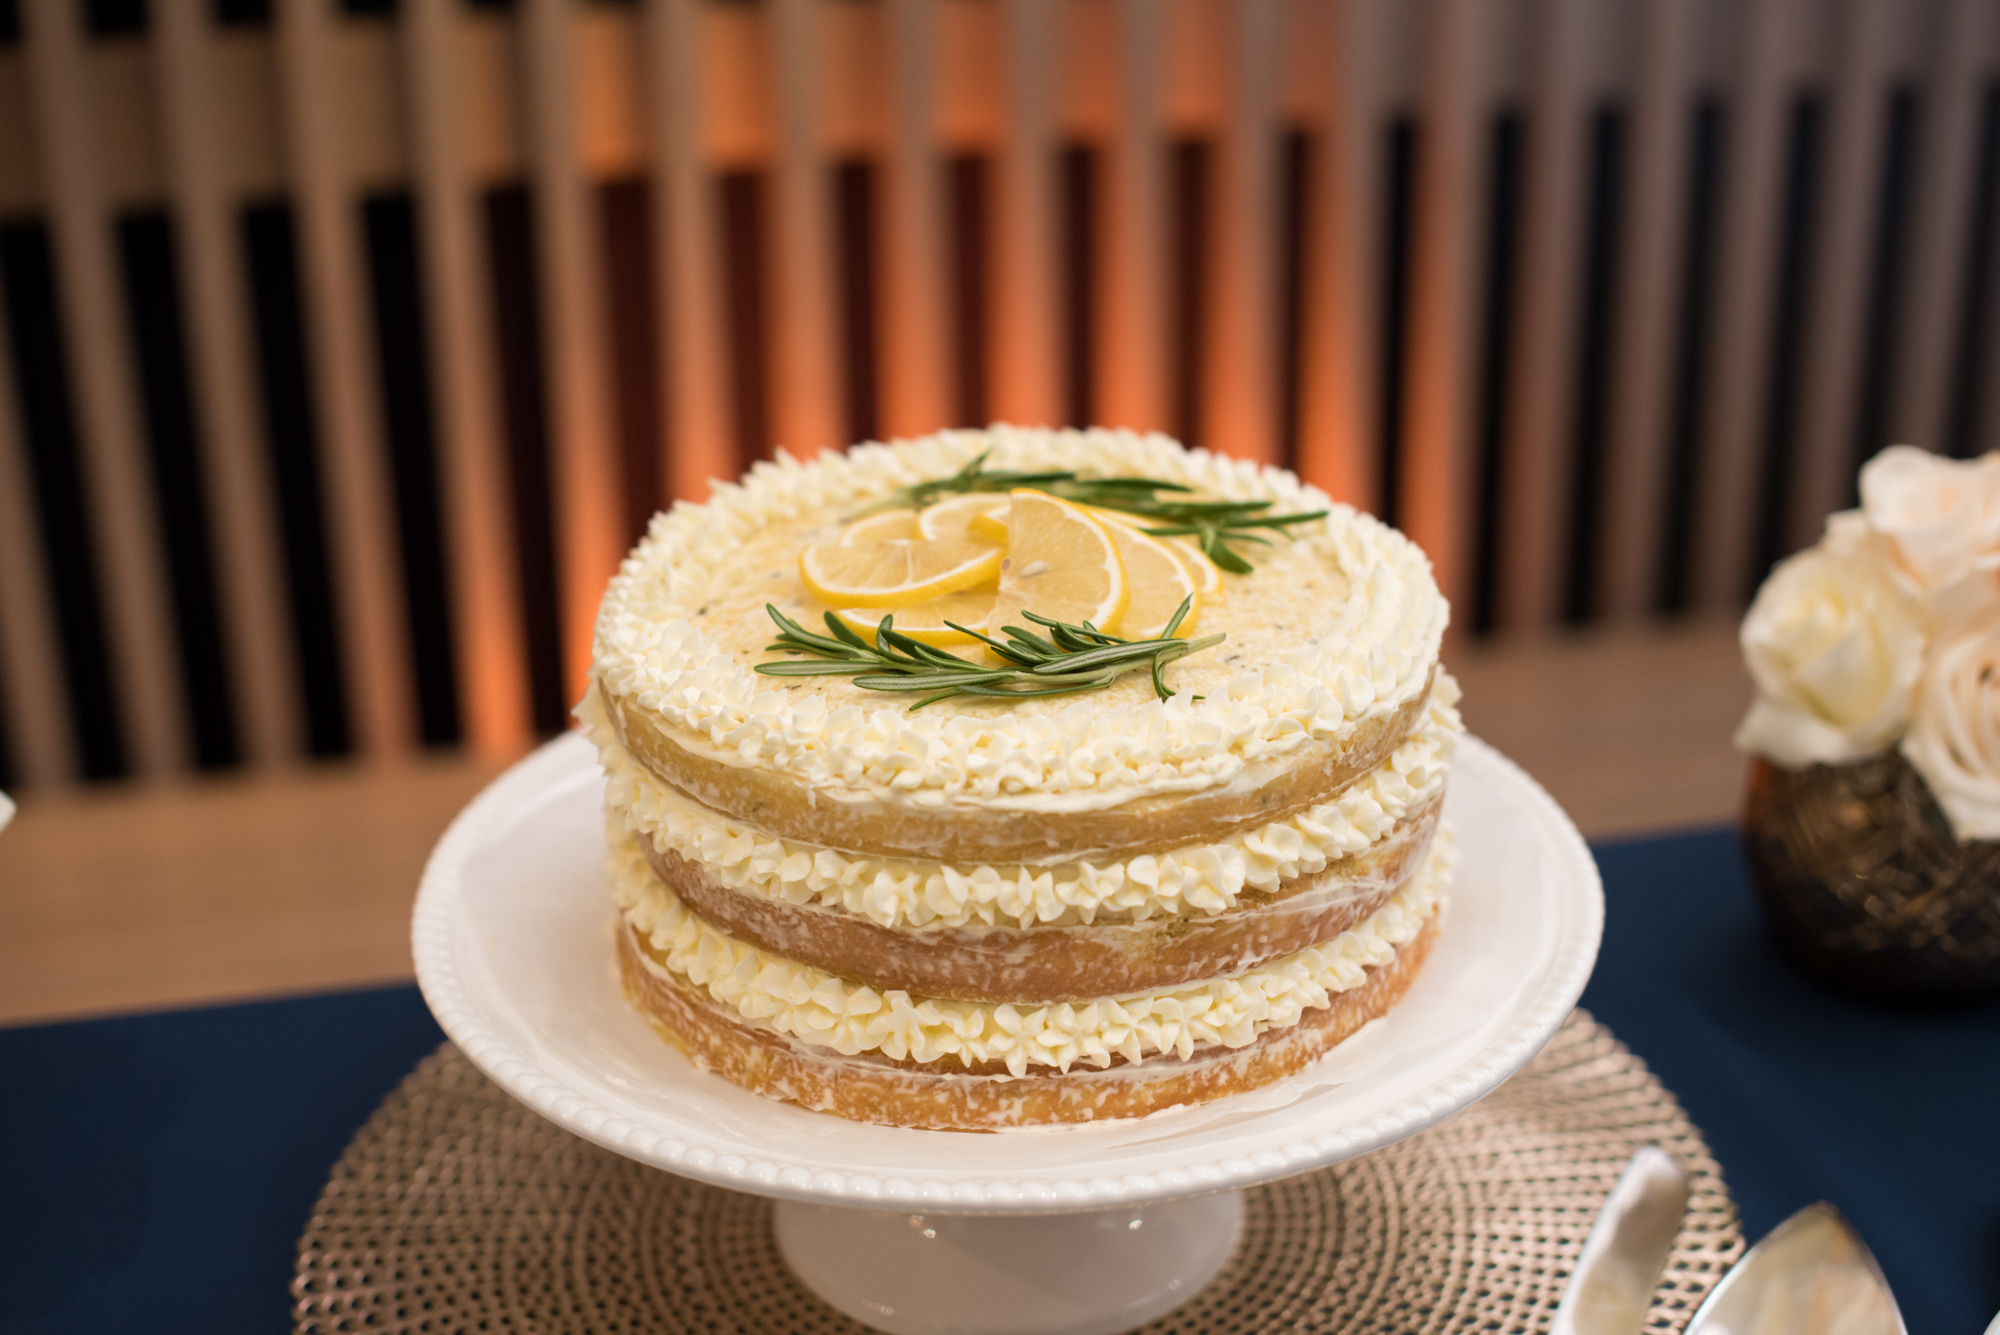 Simple Wedding Cake - Travel Themed Wedding - Caitlin Gerres PhotographyTravel Themed Wedding - Caitlin Gerres Photography